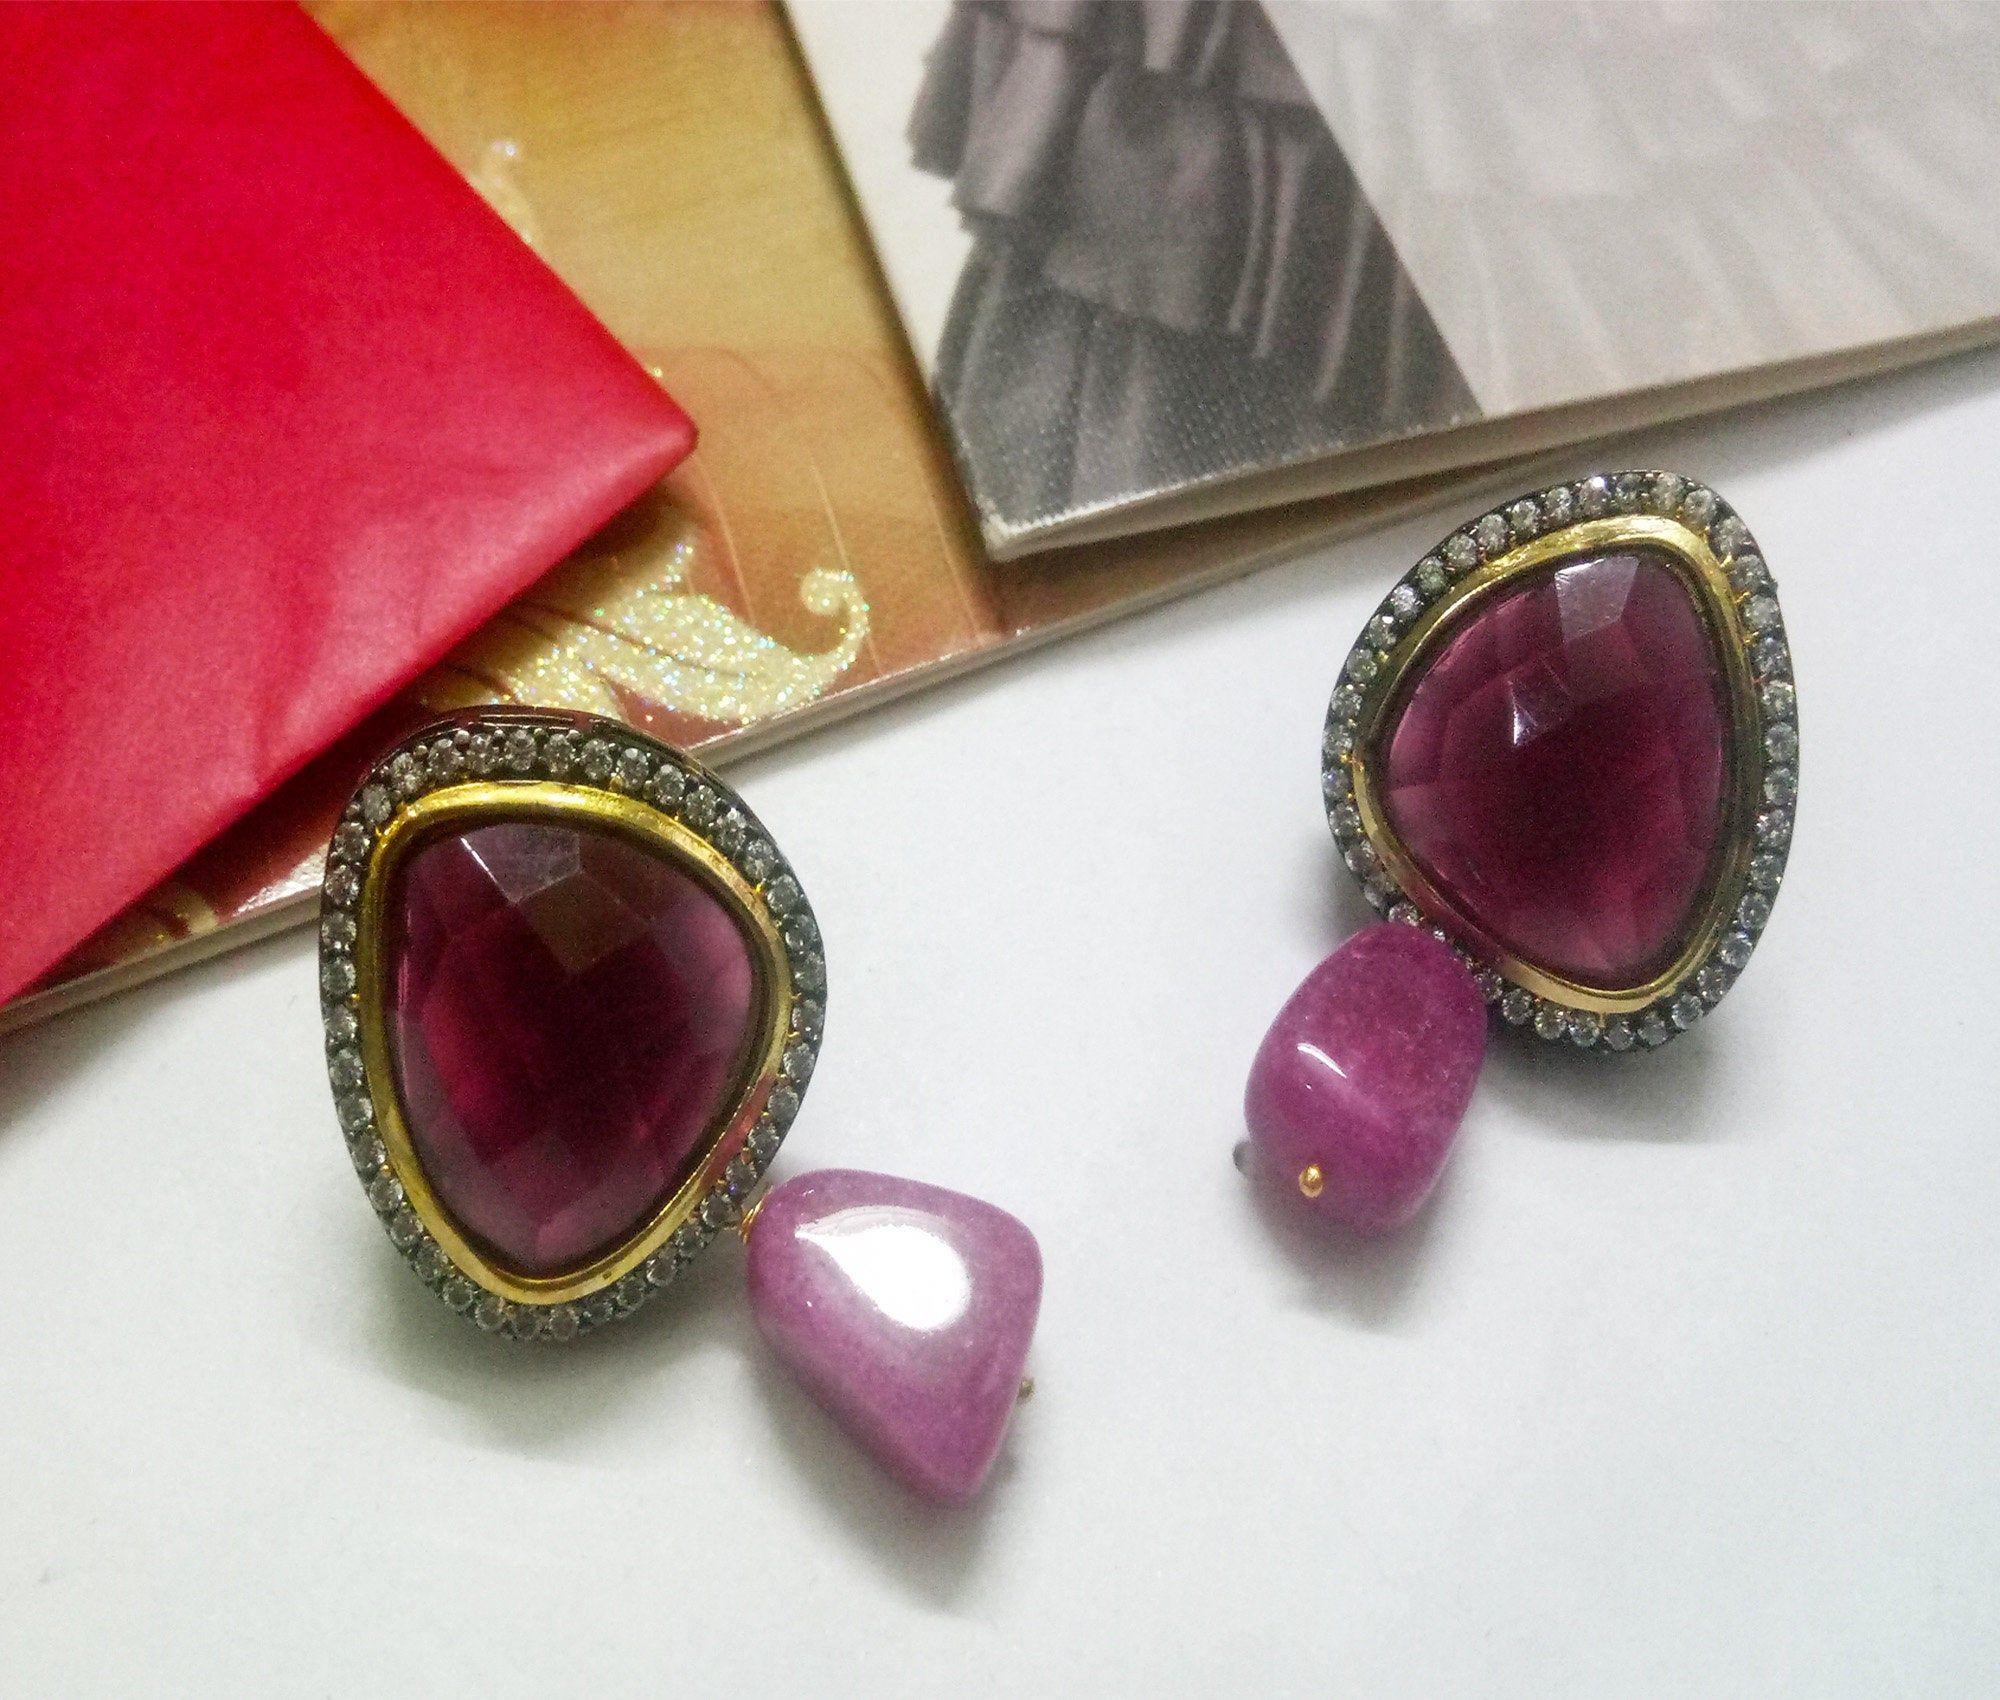 Gold and purple zirconia earrings and tikka set Indian bridal kundan Pakistani jewelry